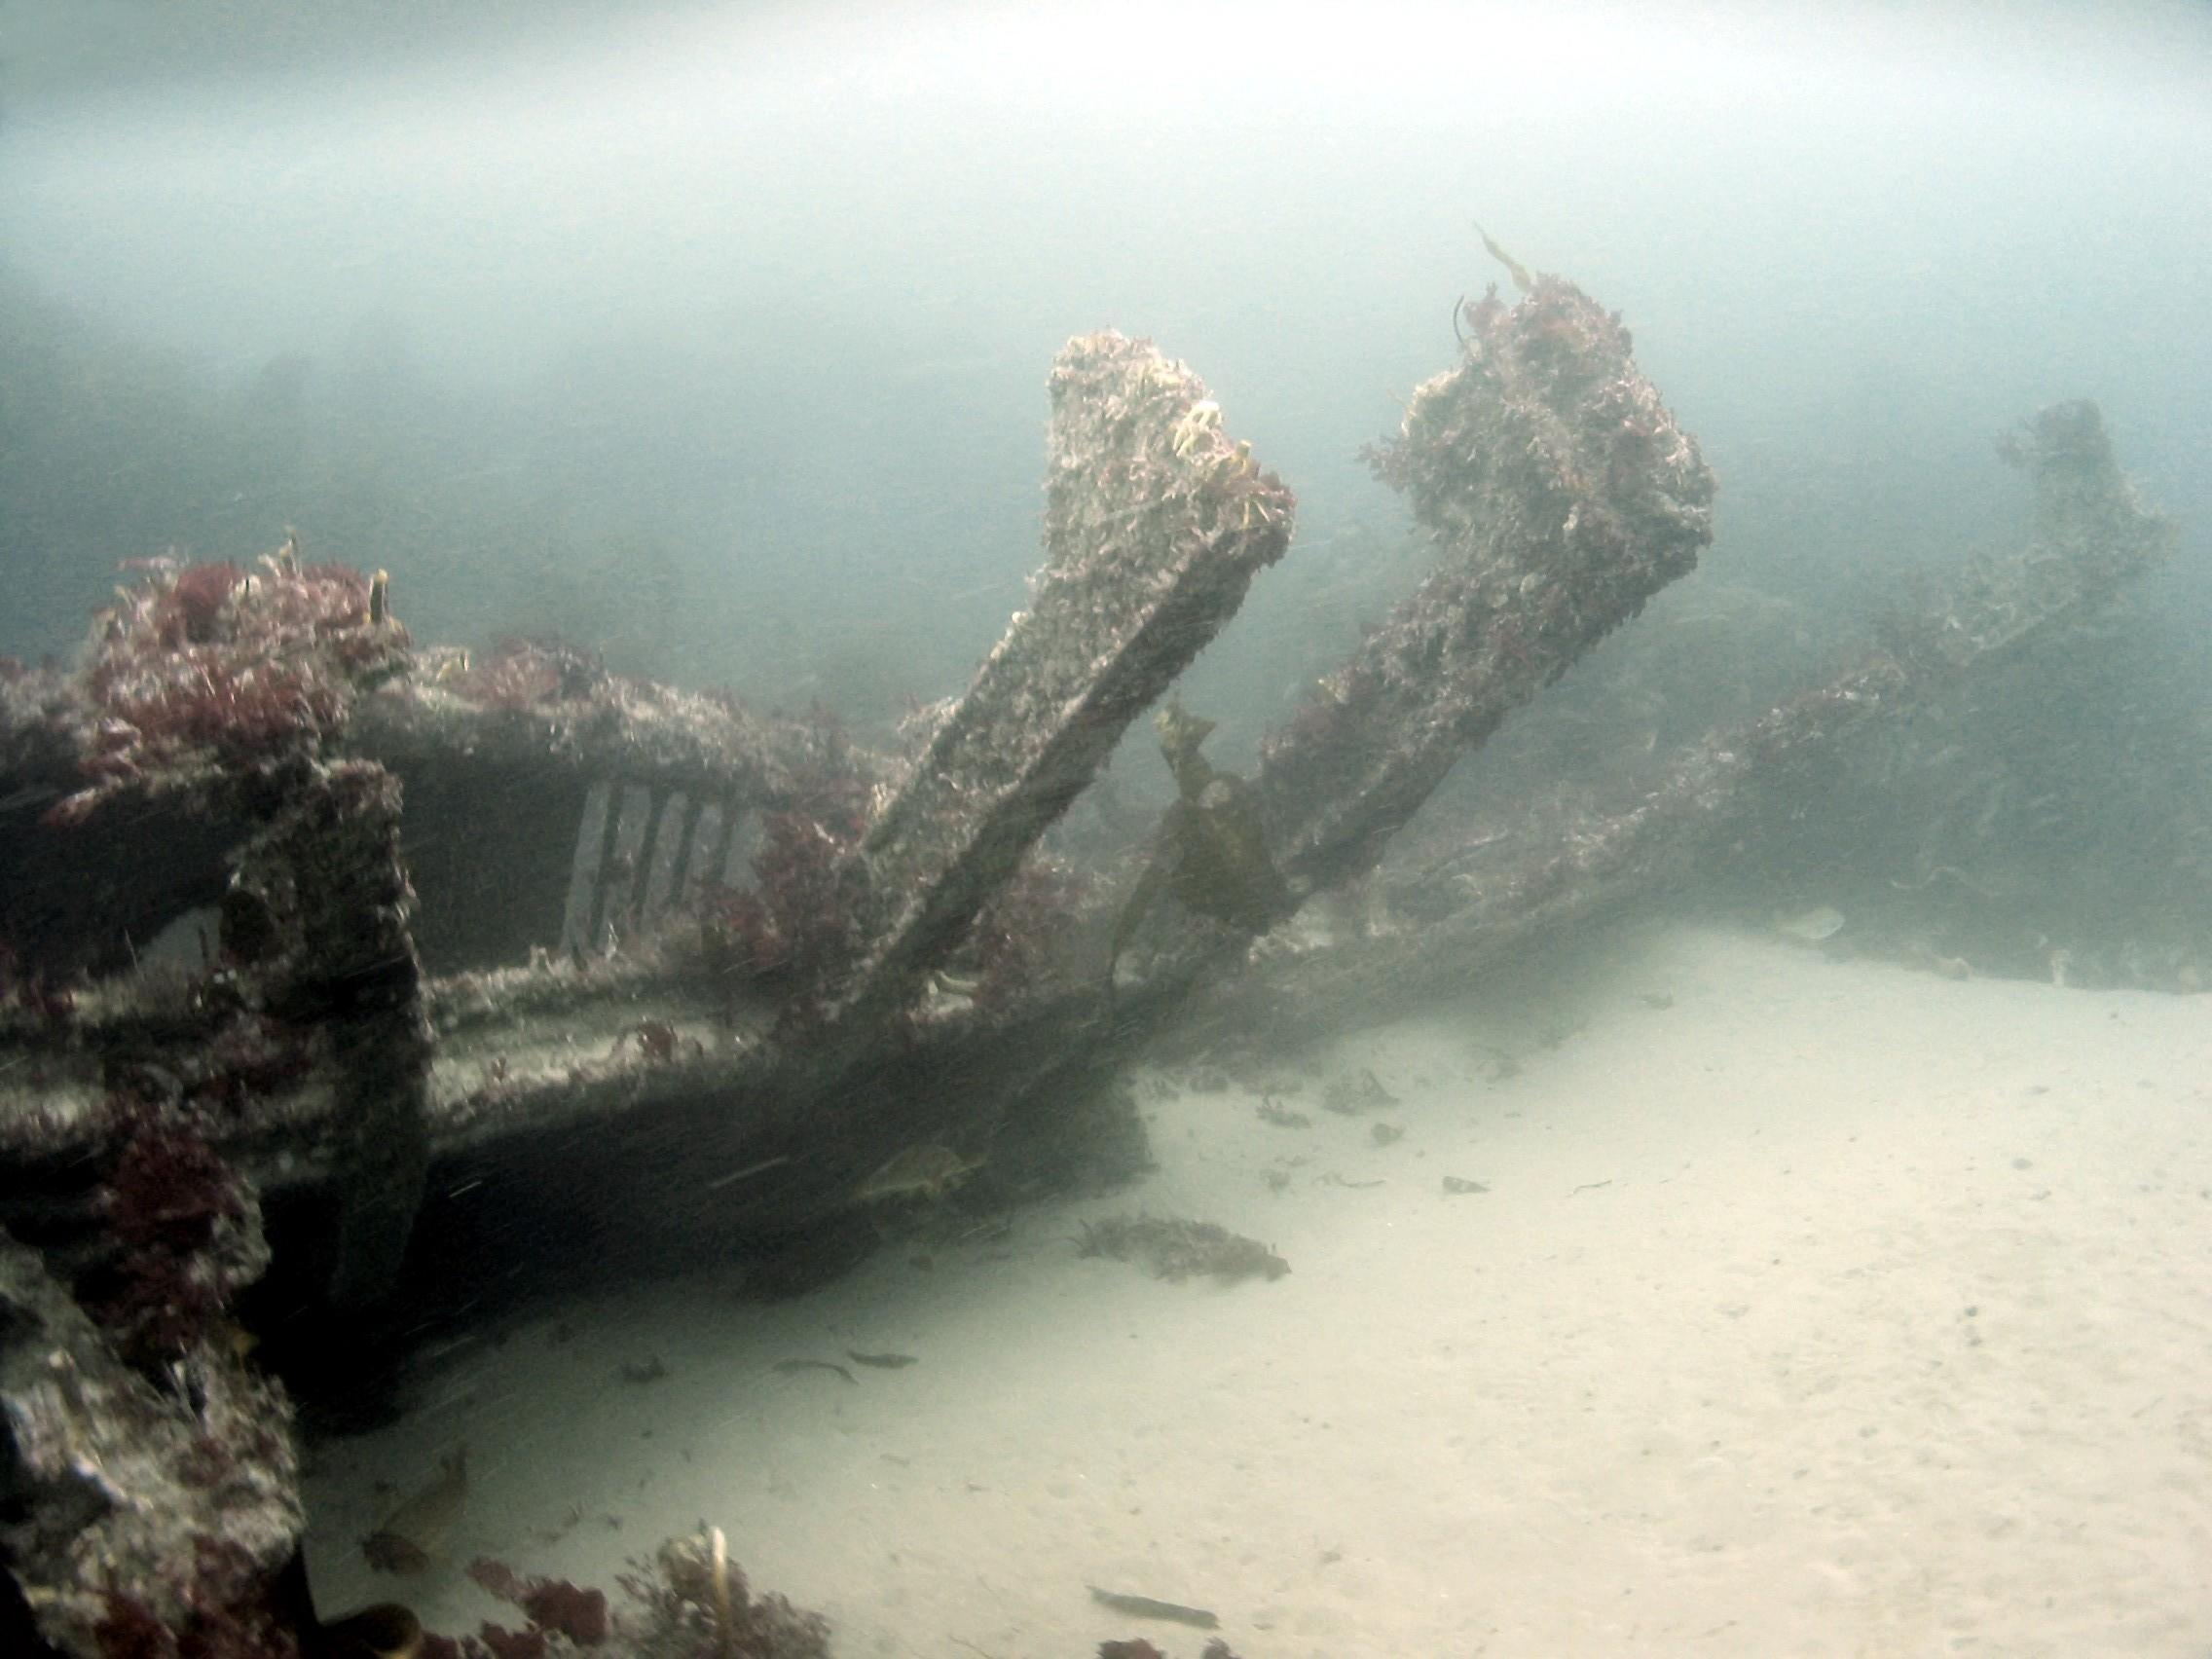 Stern frames of the HMS Drake